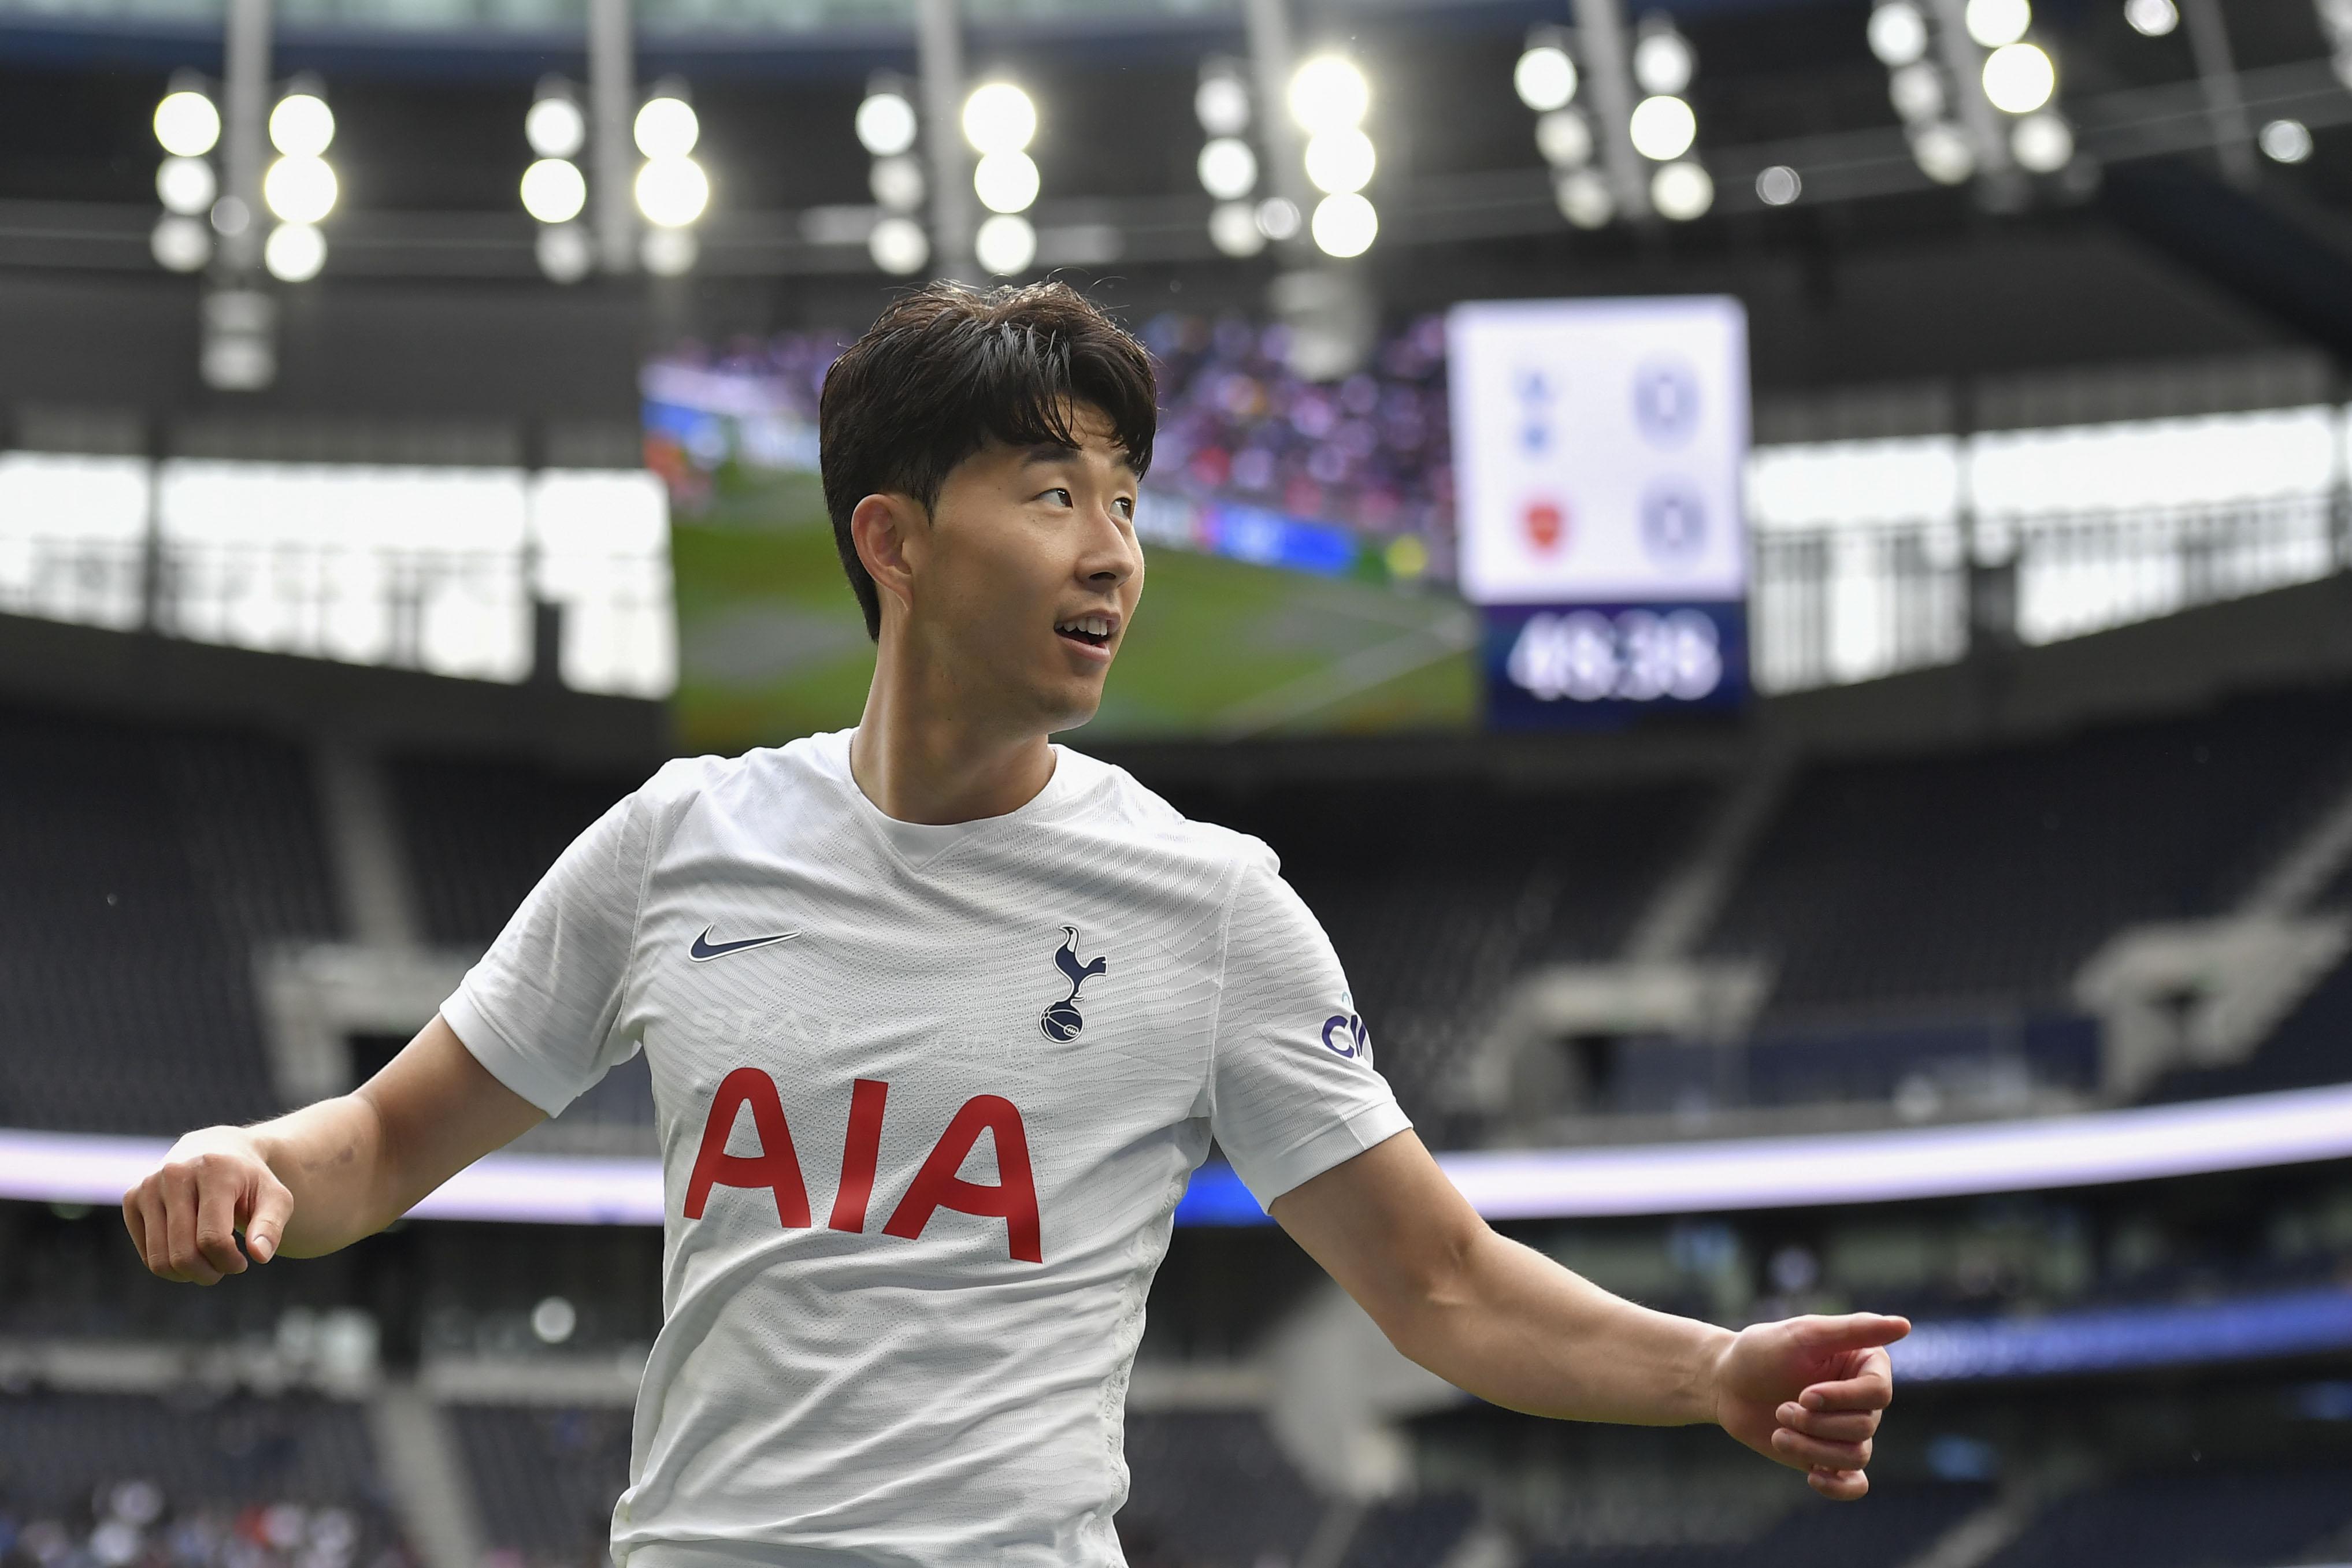 Tottenham Hotspur v Arsenal - The MIND Series